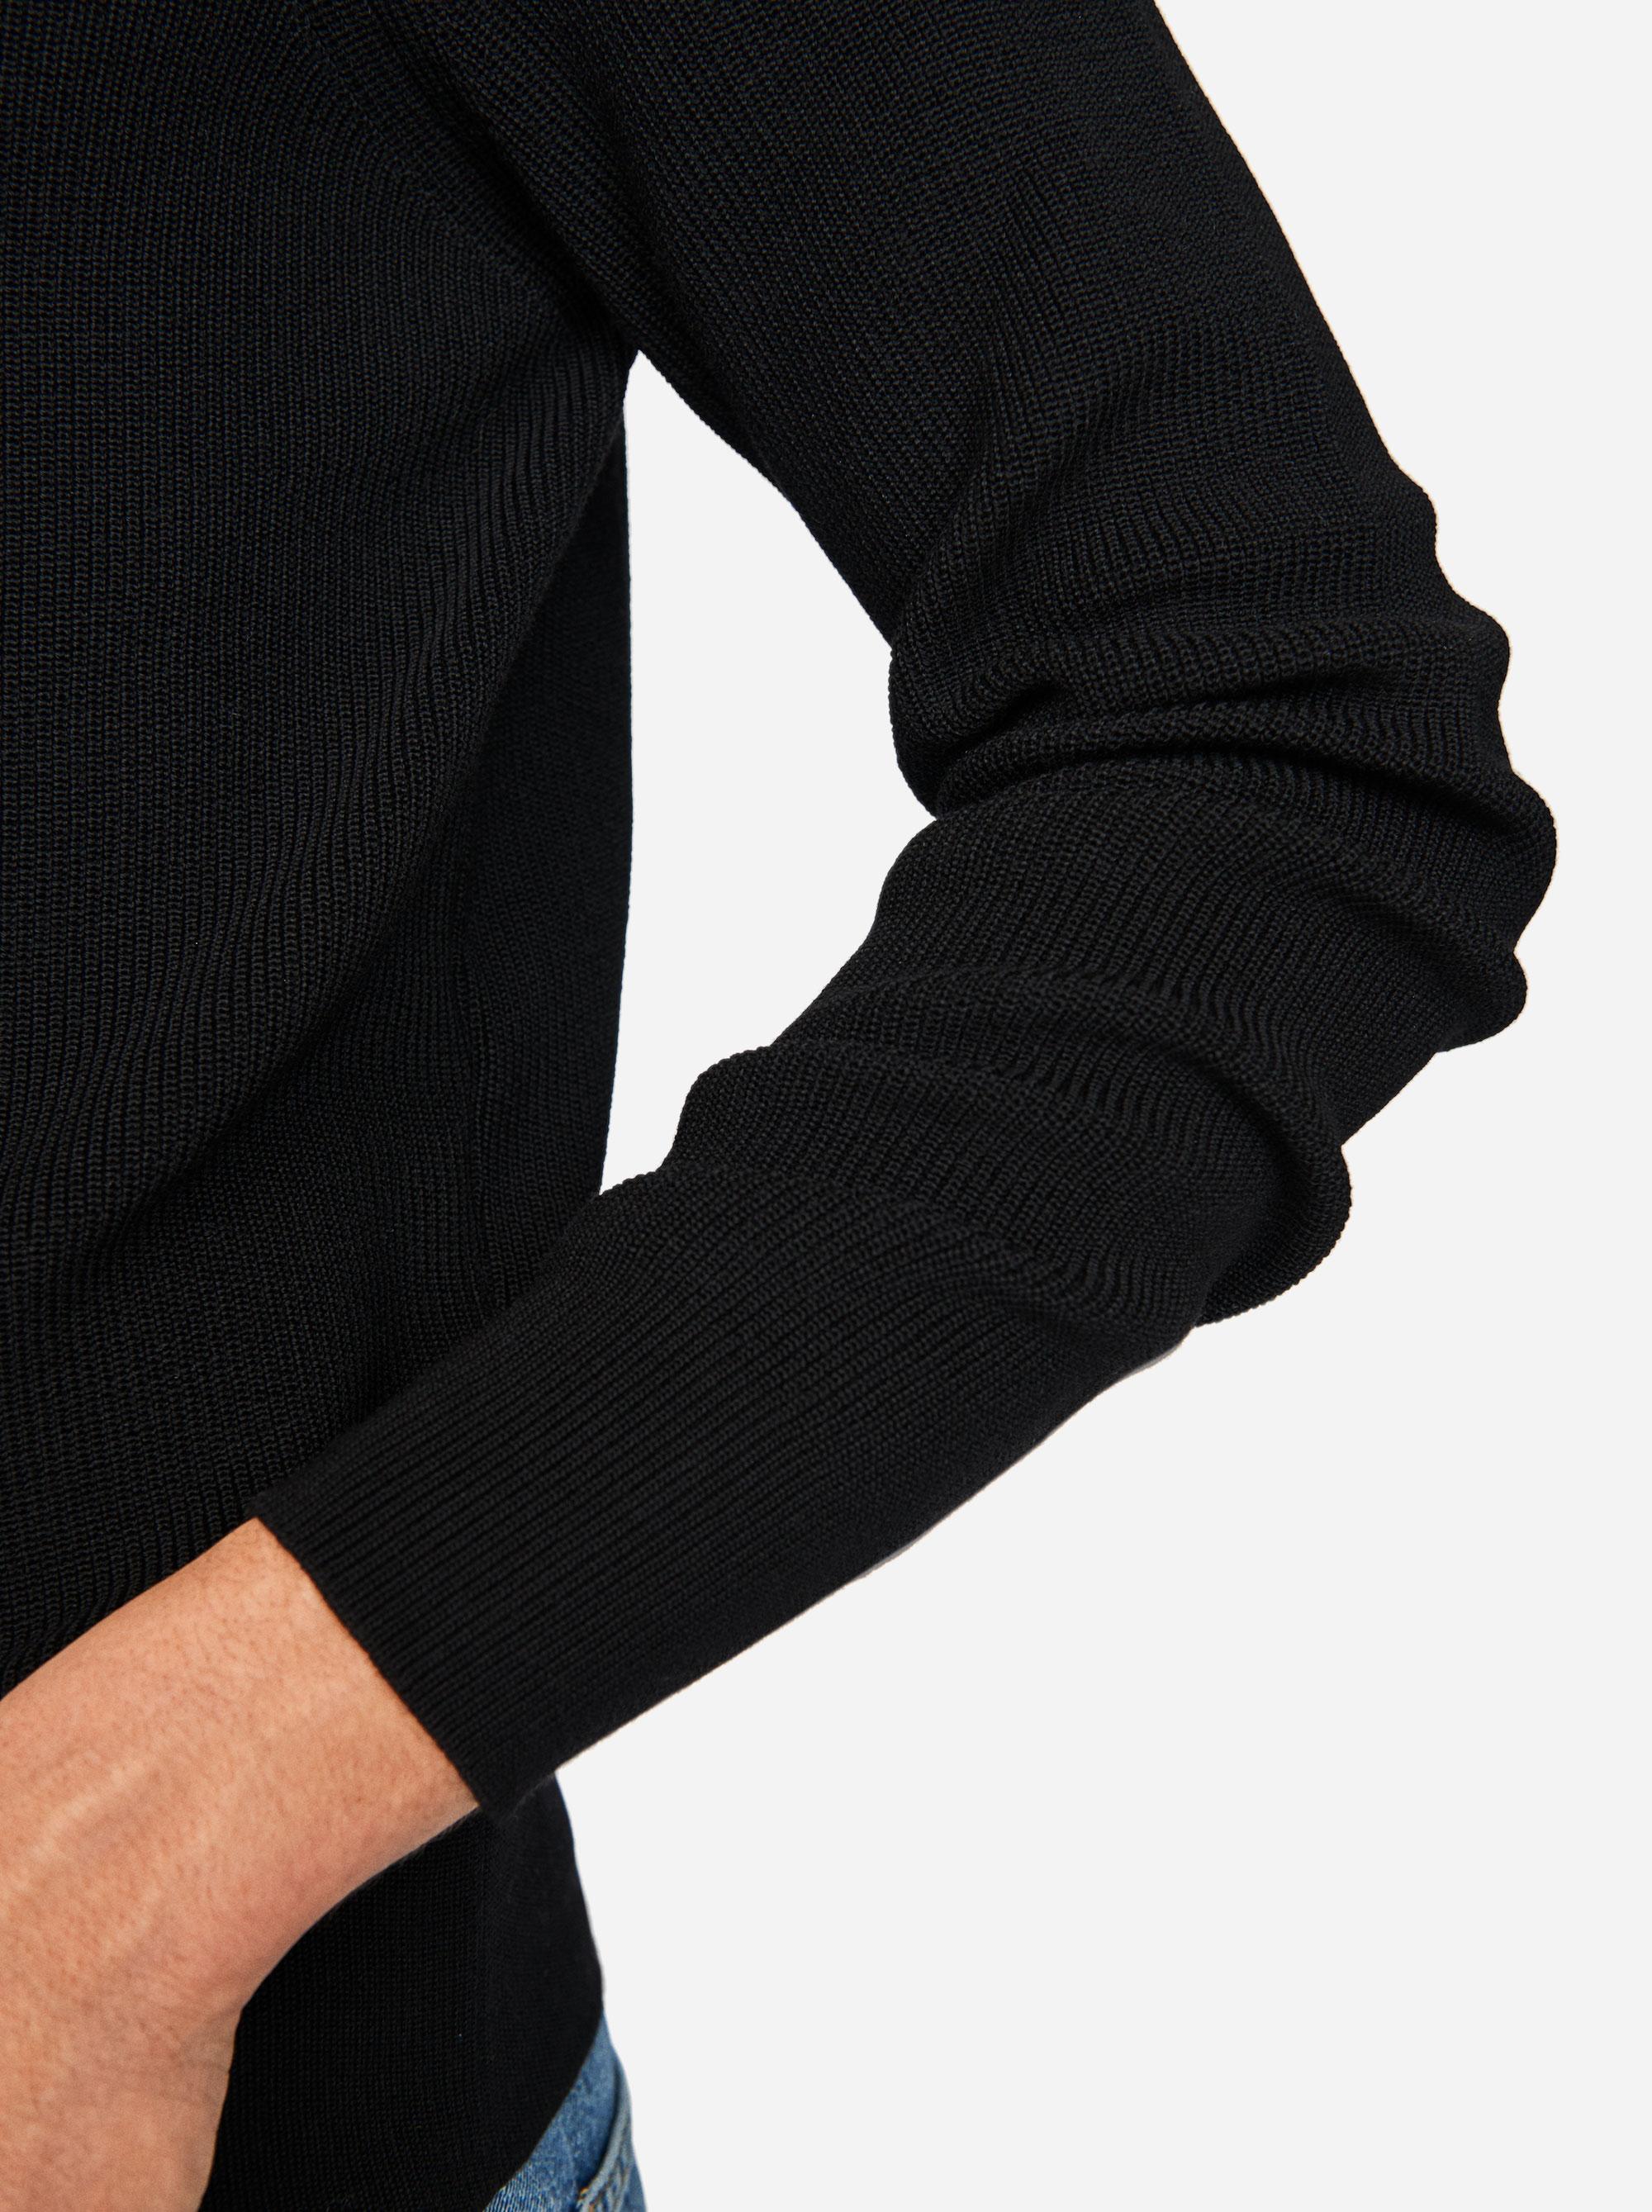 Teym - The Merino Sweater - Men - Black - 2